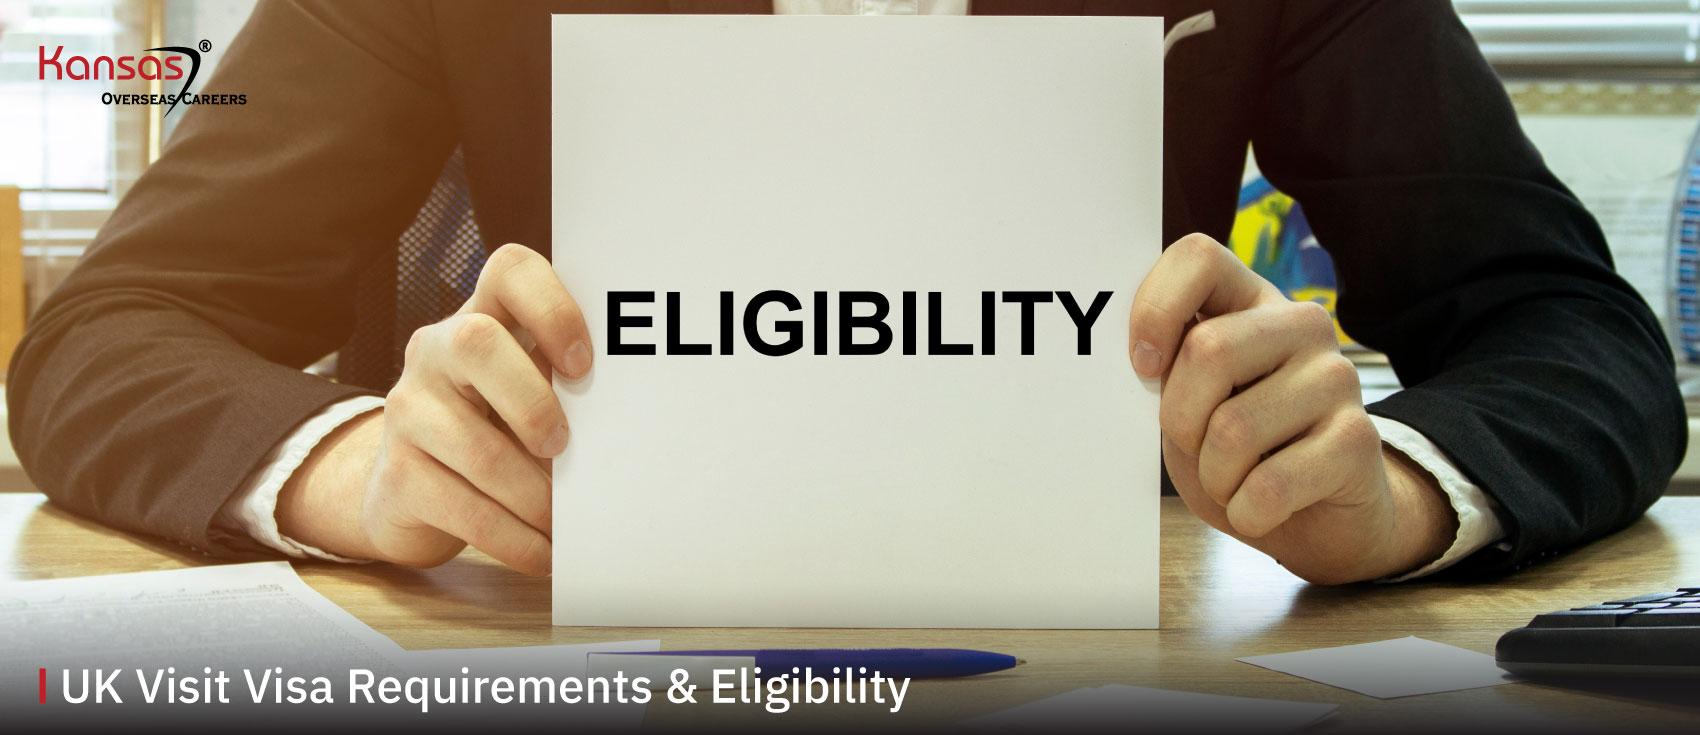 UK-Visit-Visa-Requirements-&-Eligibility-